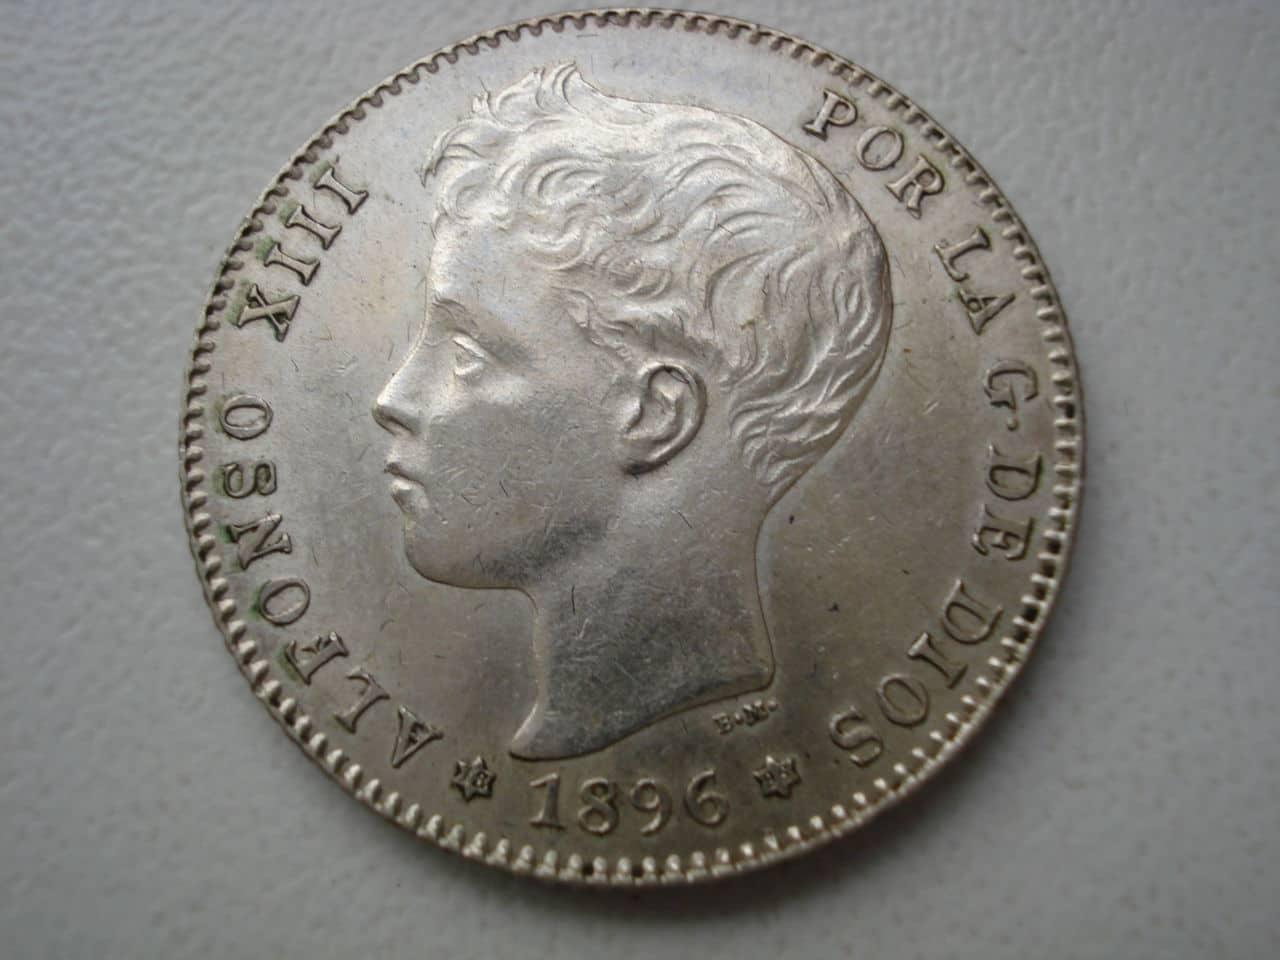 peseta 1896 Alfonso XIII. Dedicada a Estrella76. Monedas_007